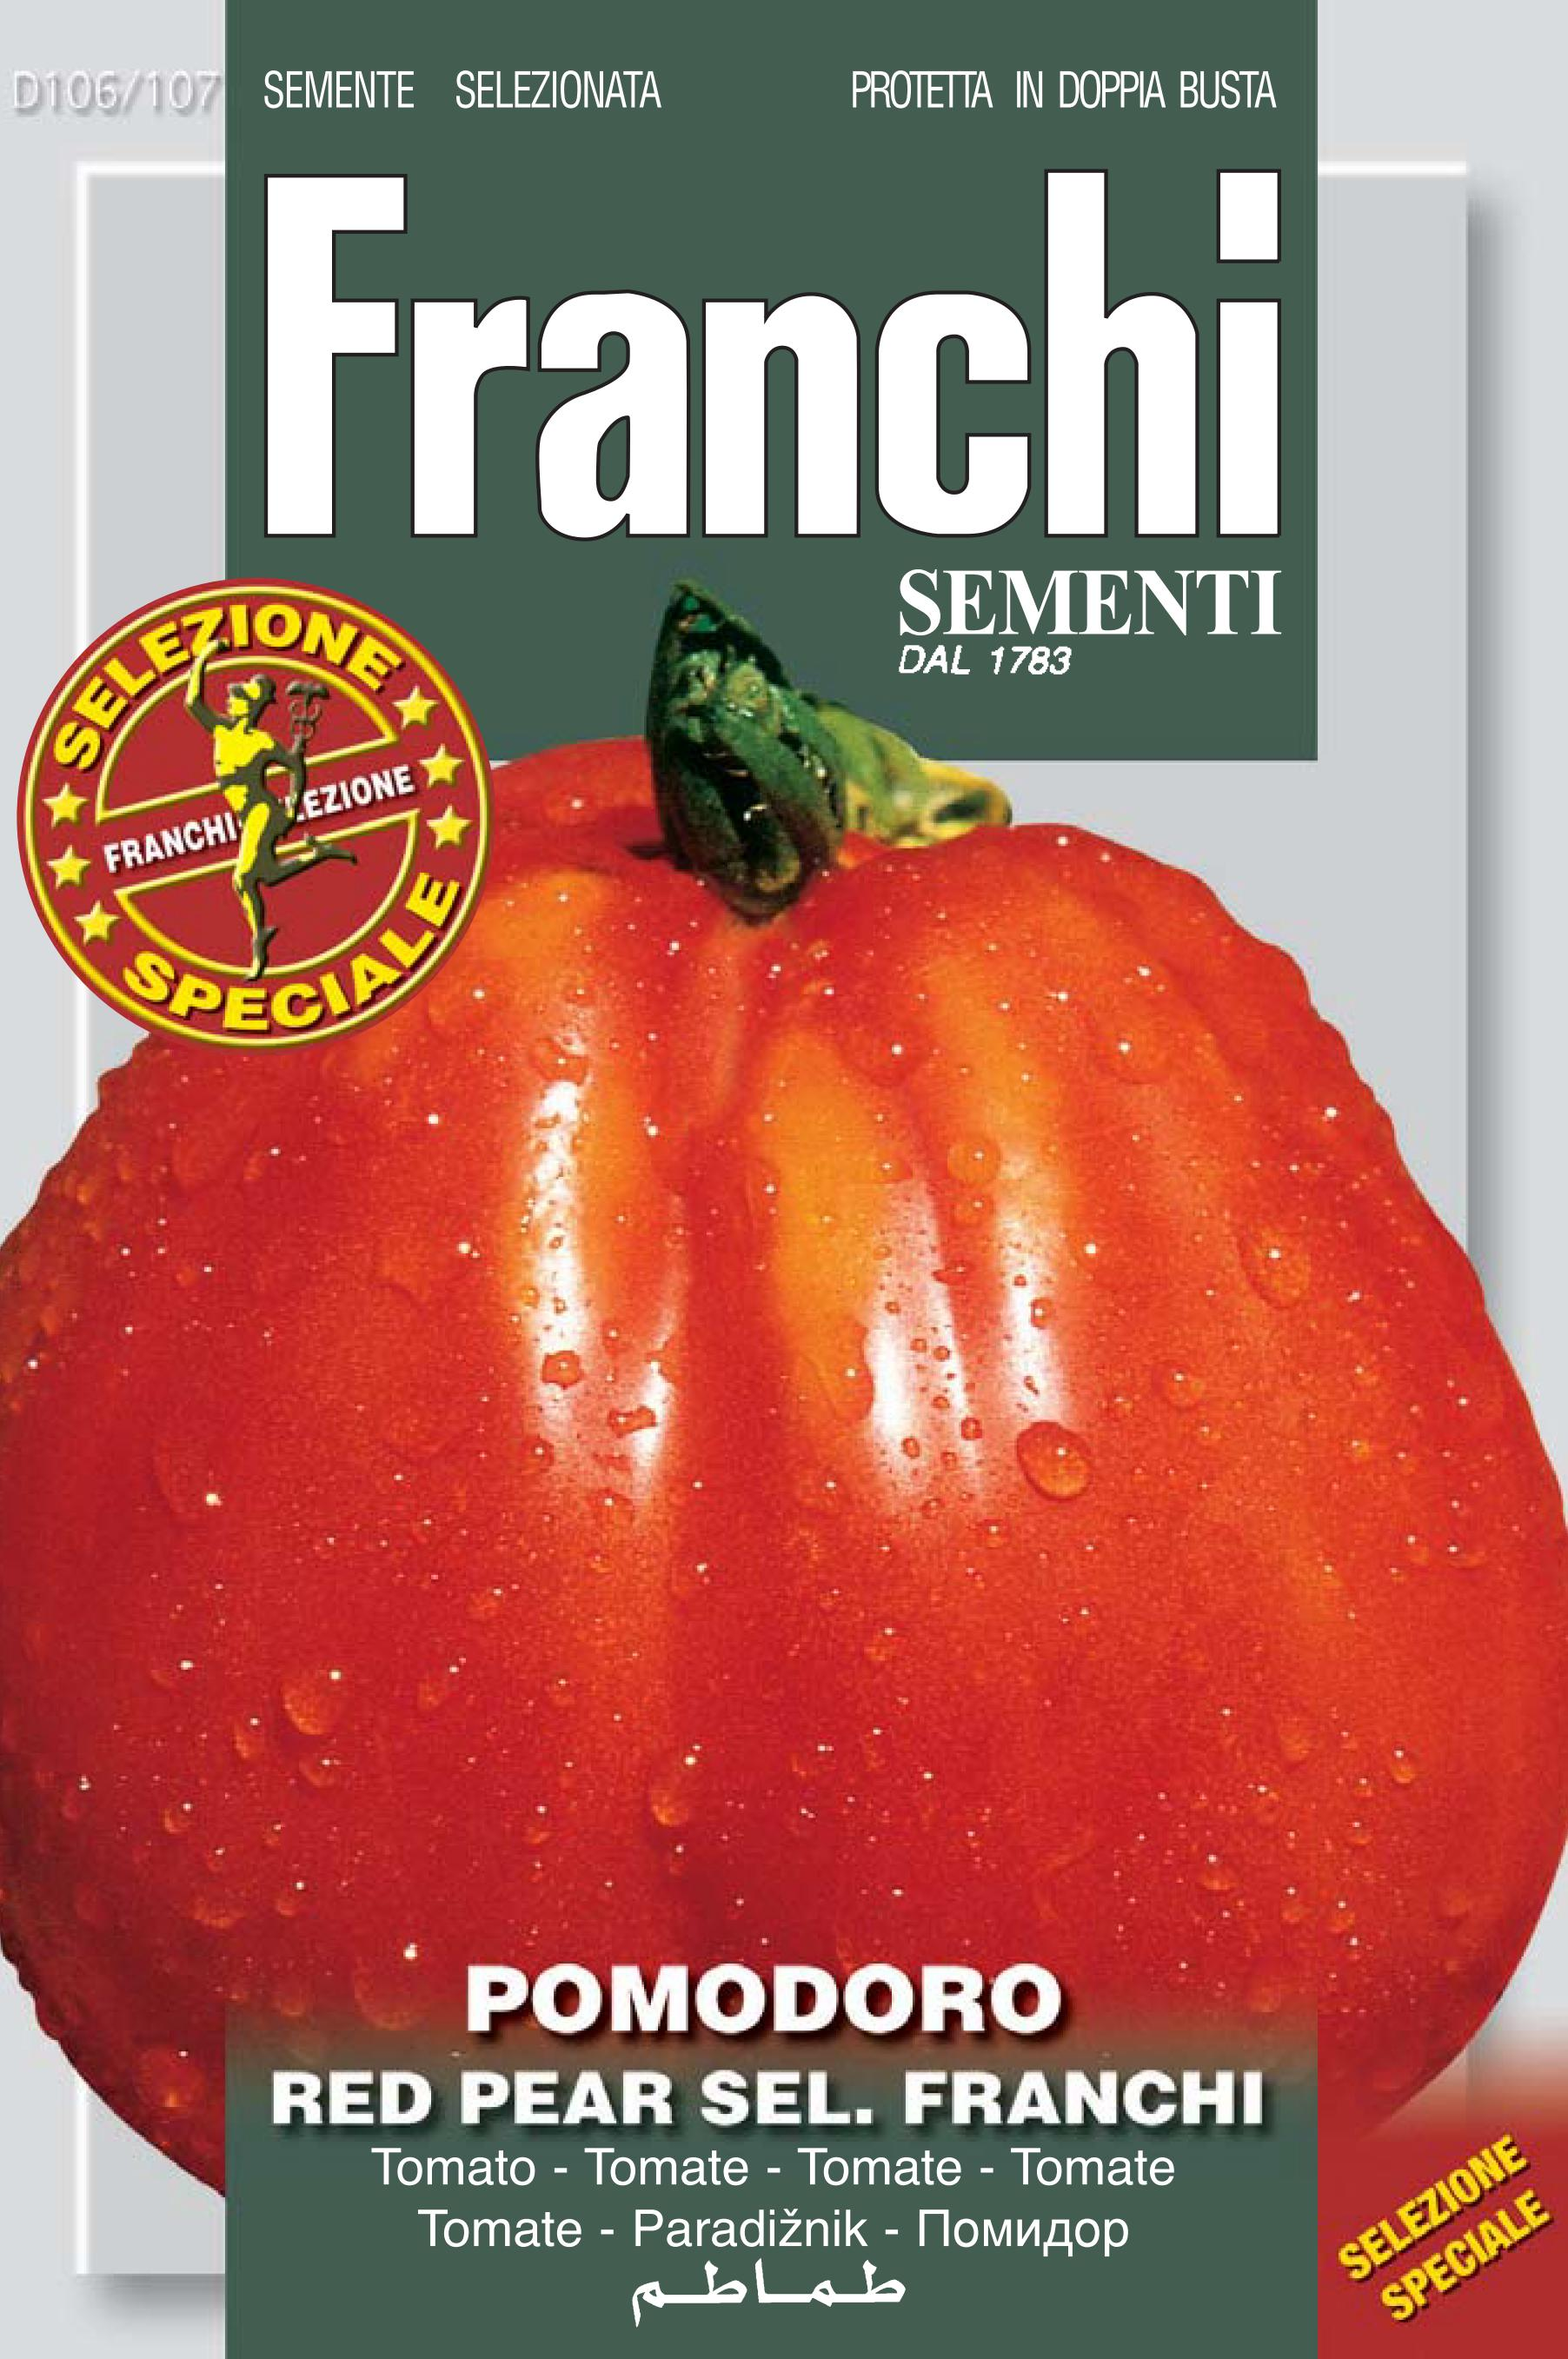 Tomato Red Pear Franchi Of Bergamo (A) Solanum Lycopersicum L.